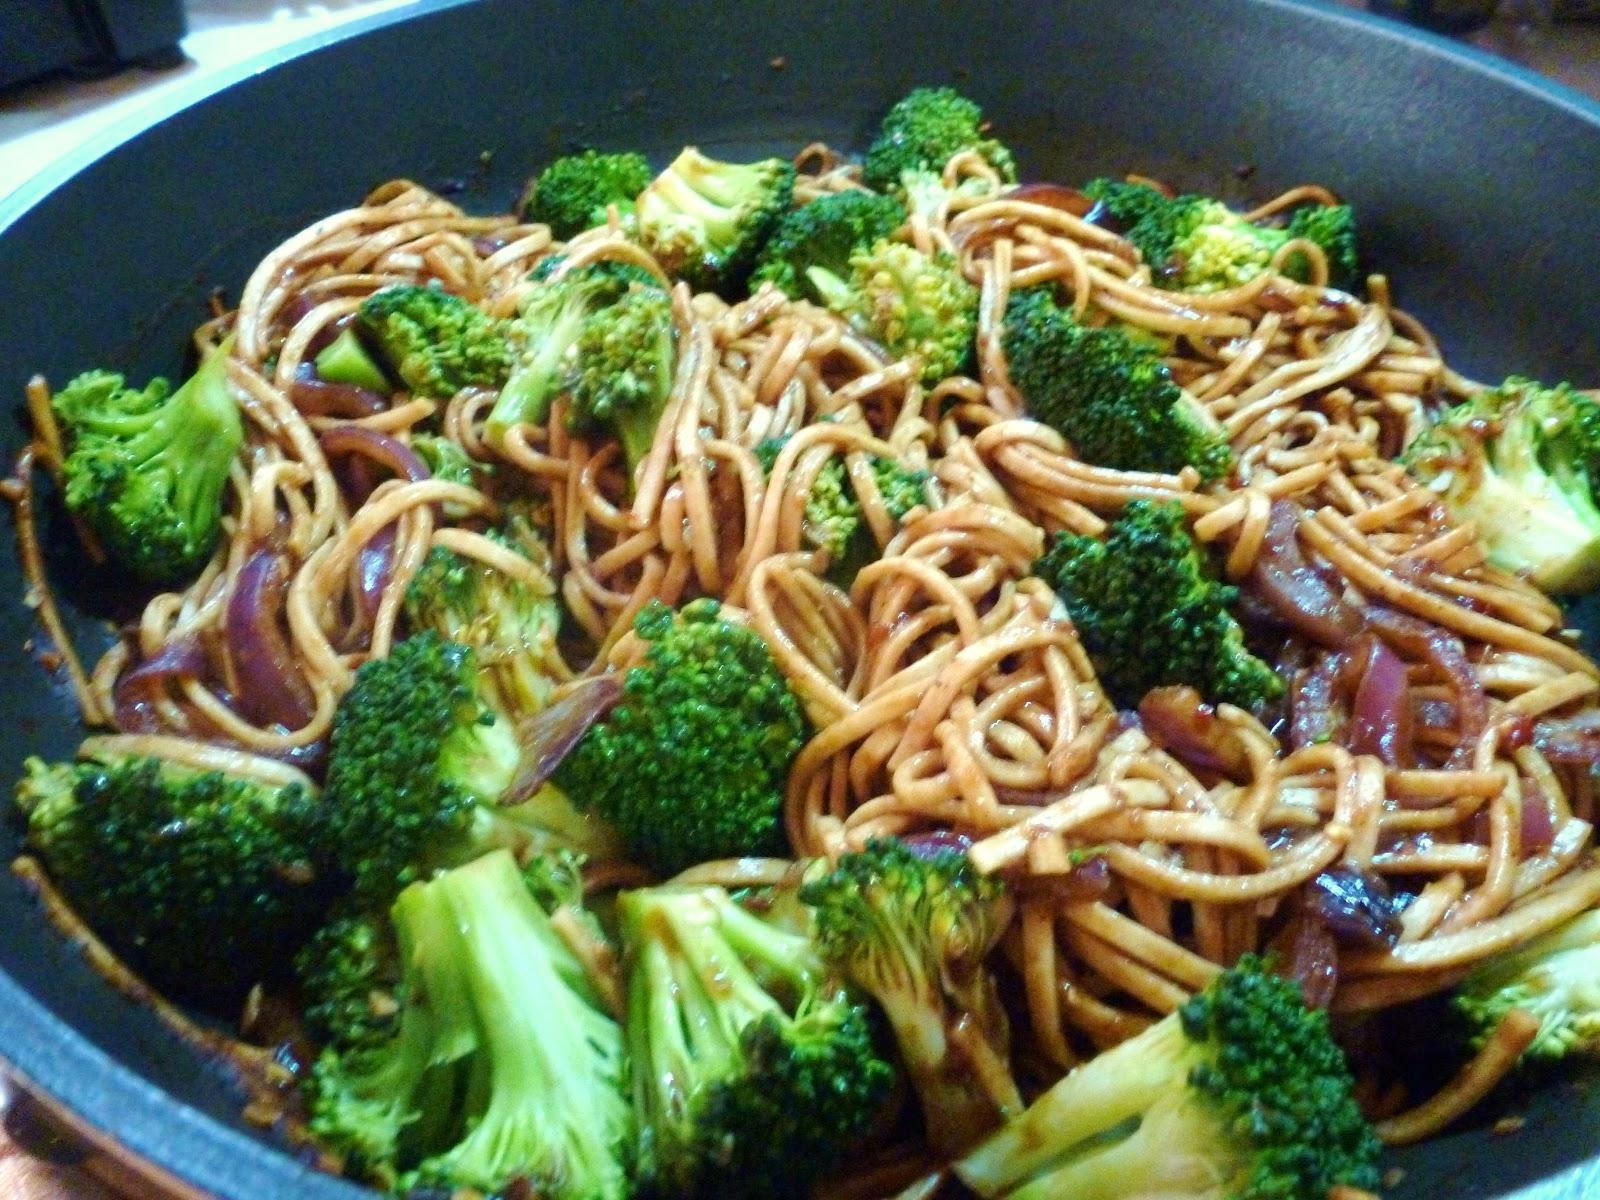 my adventures testing 1000 vegan recipes: may 2013